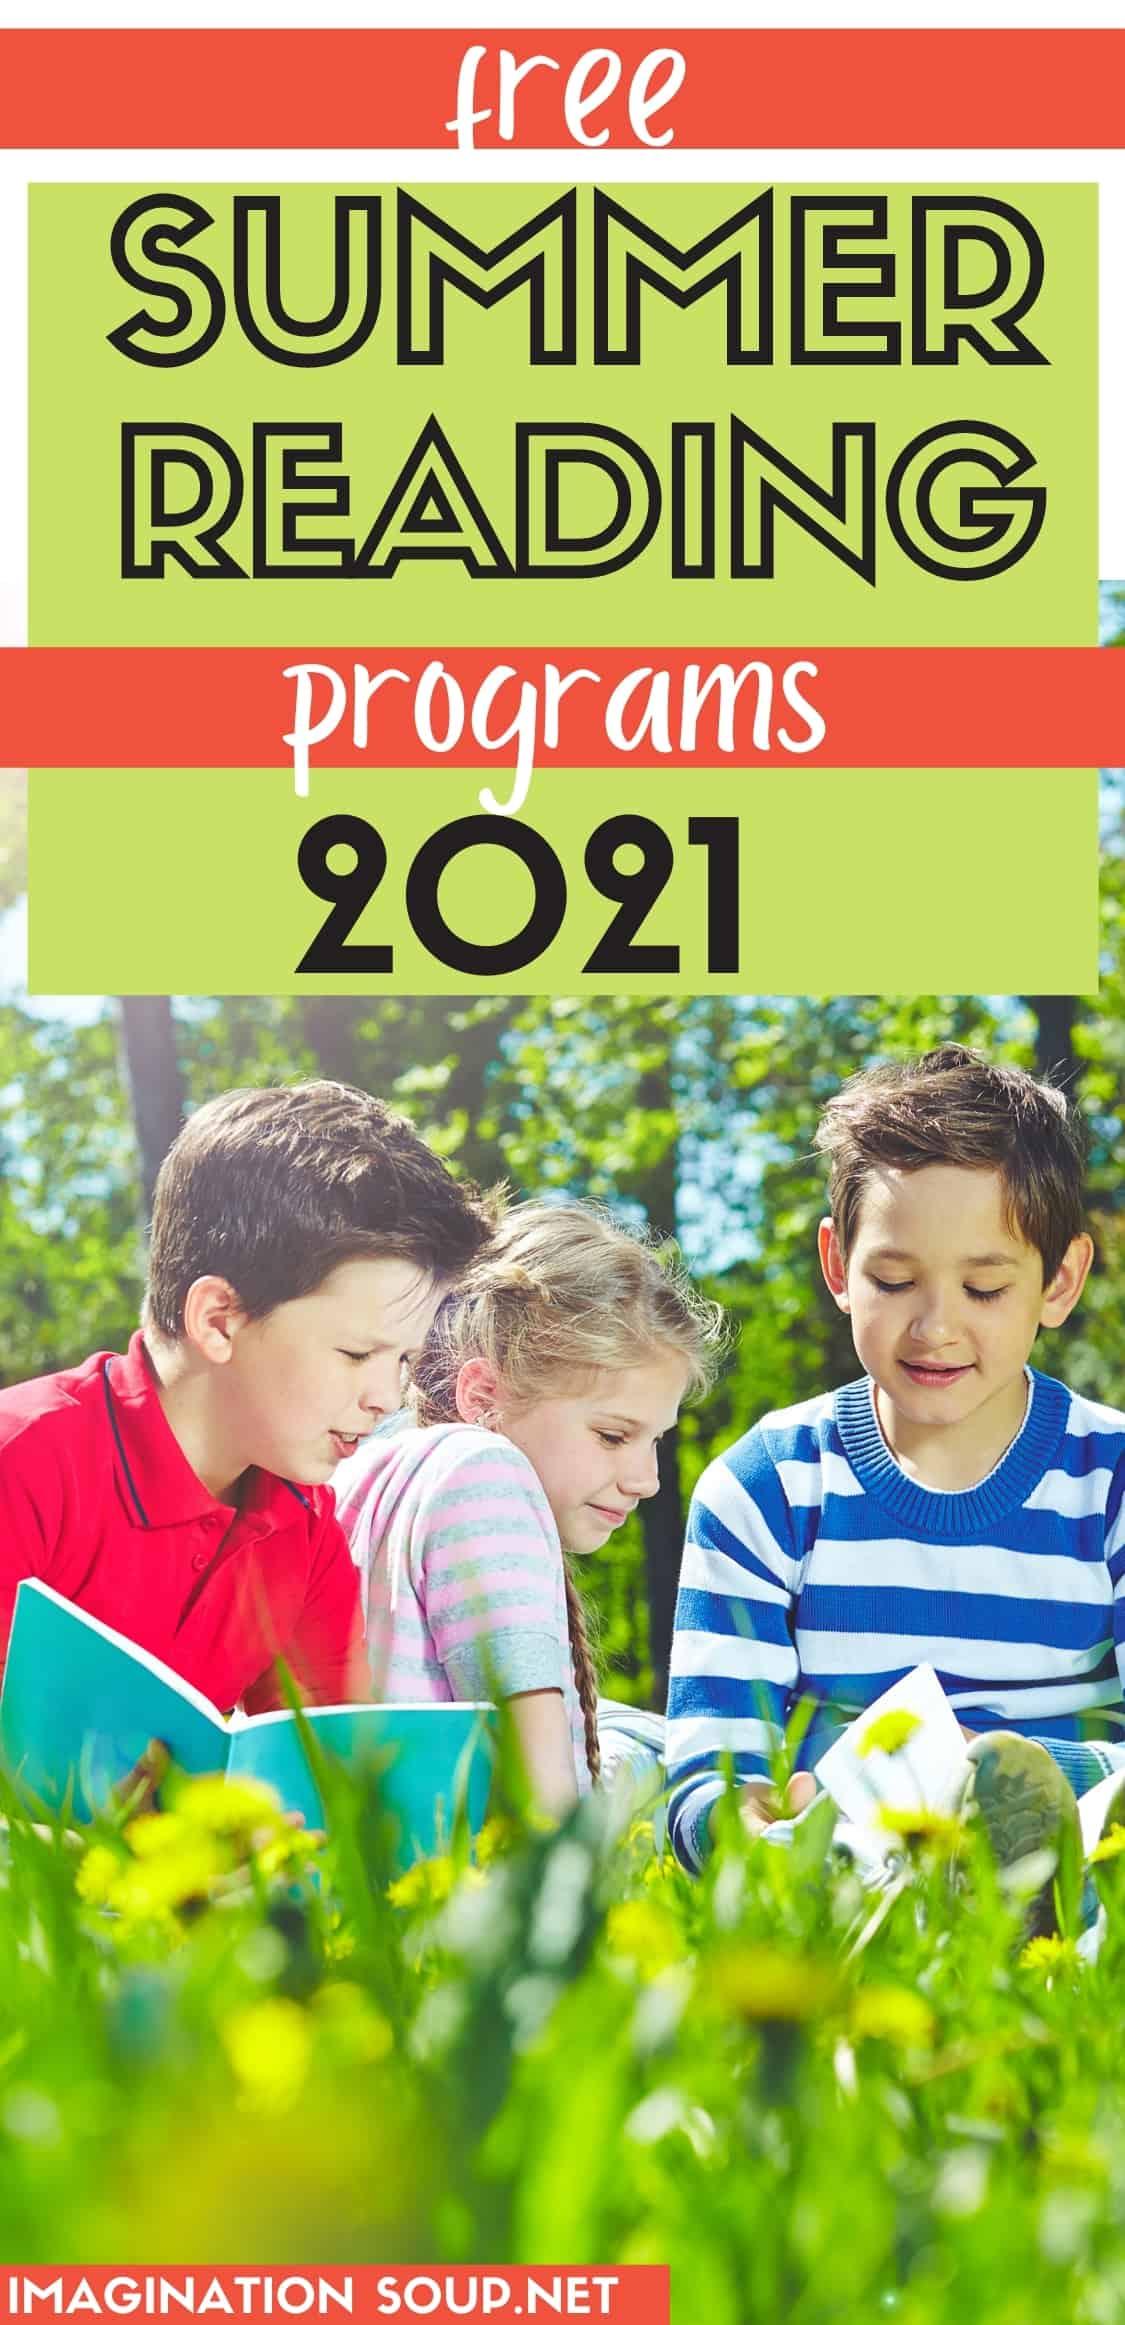 2021 free summer reading programs